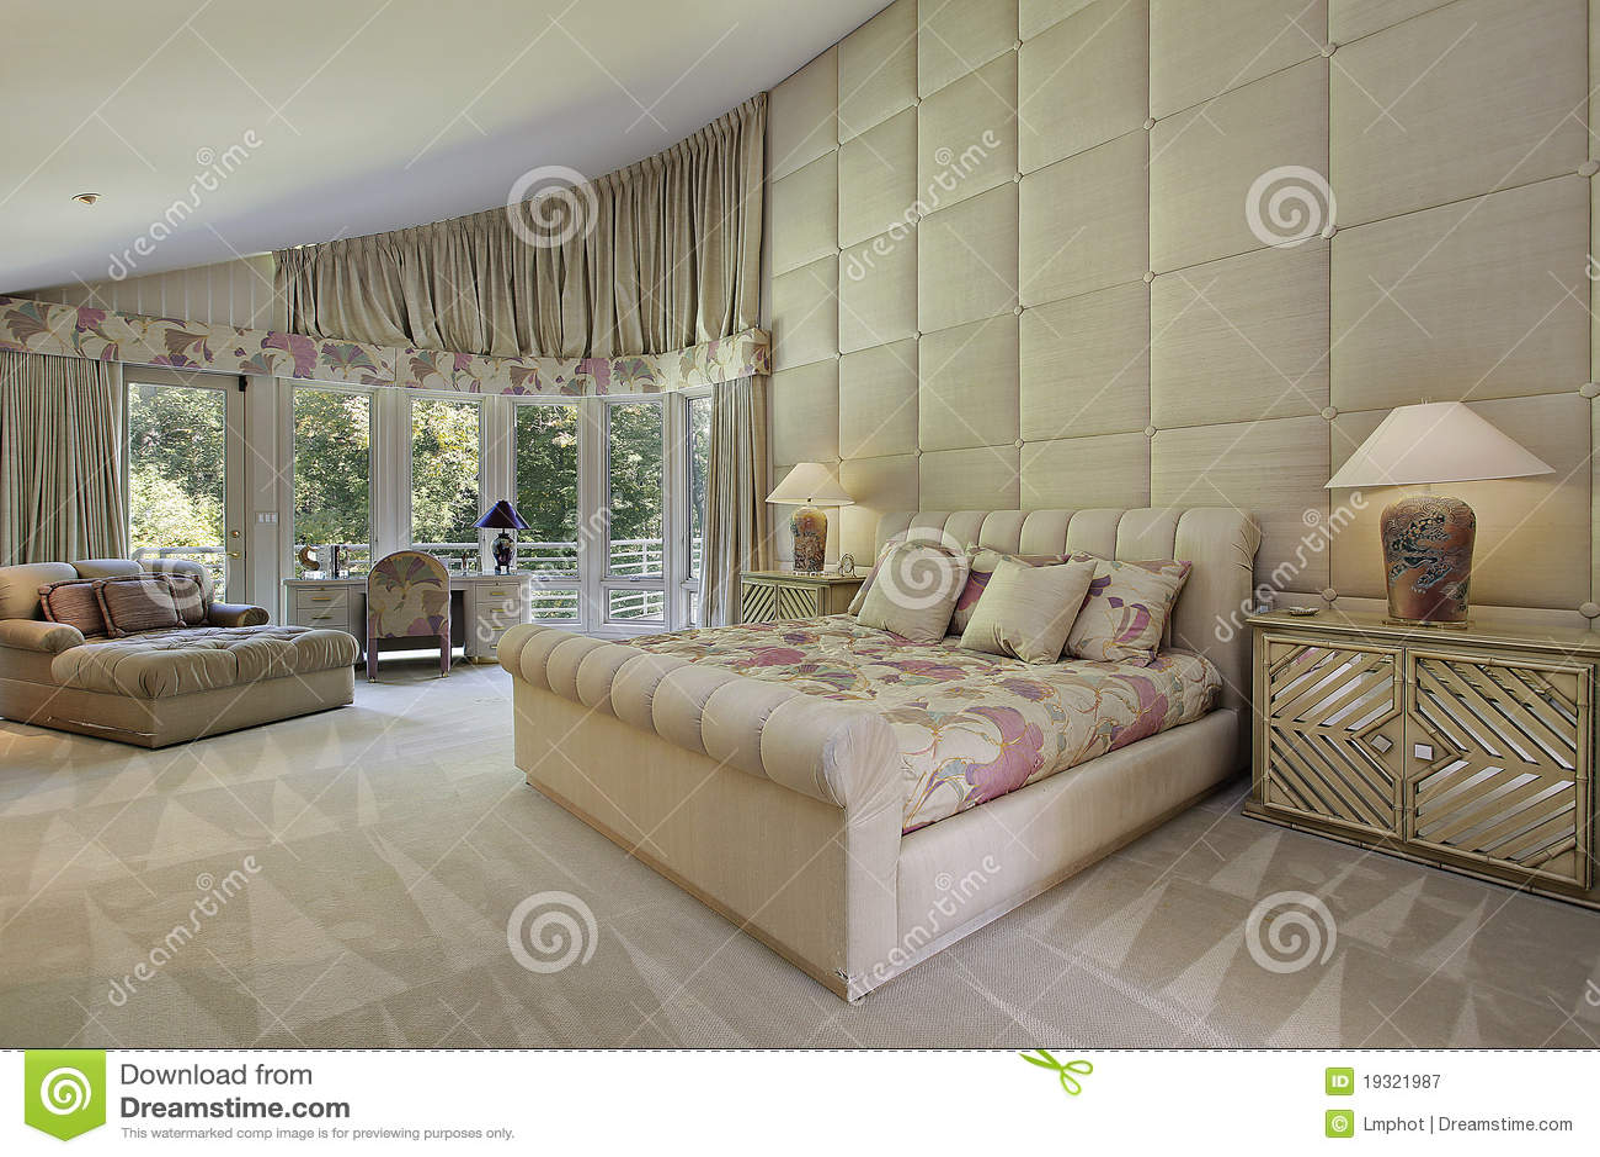 Large Master Bedroom Large Master Bedroom With Fireplace Stock Photo Image 55960248